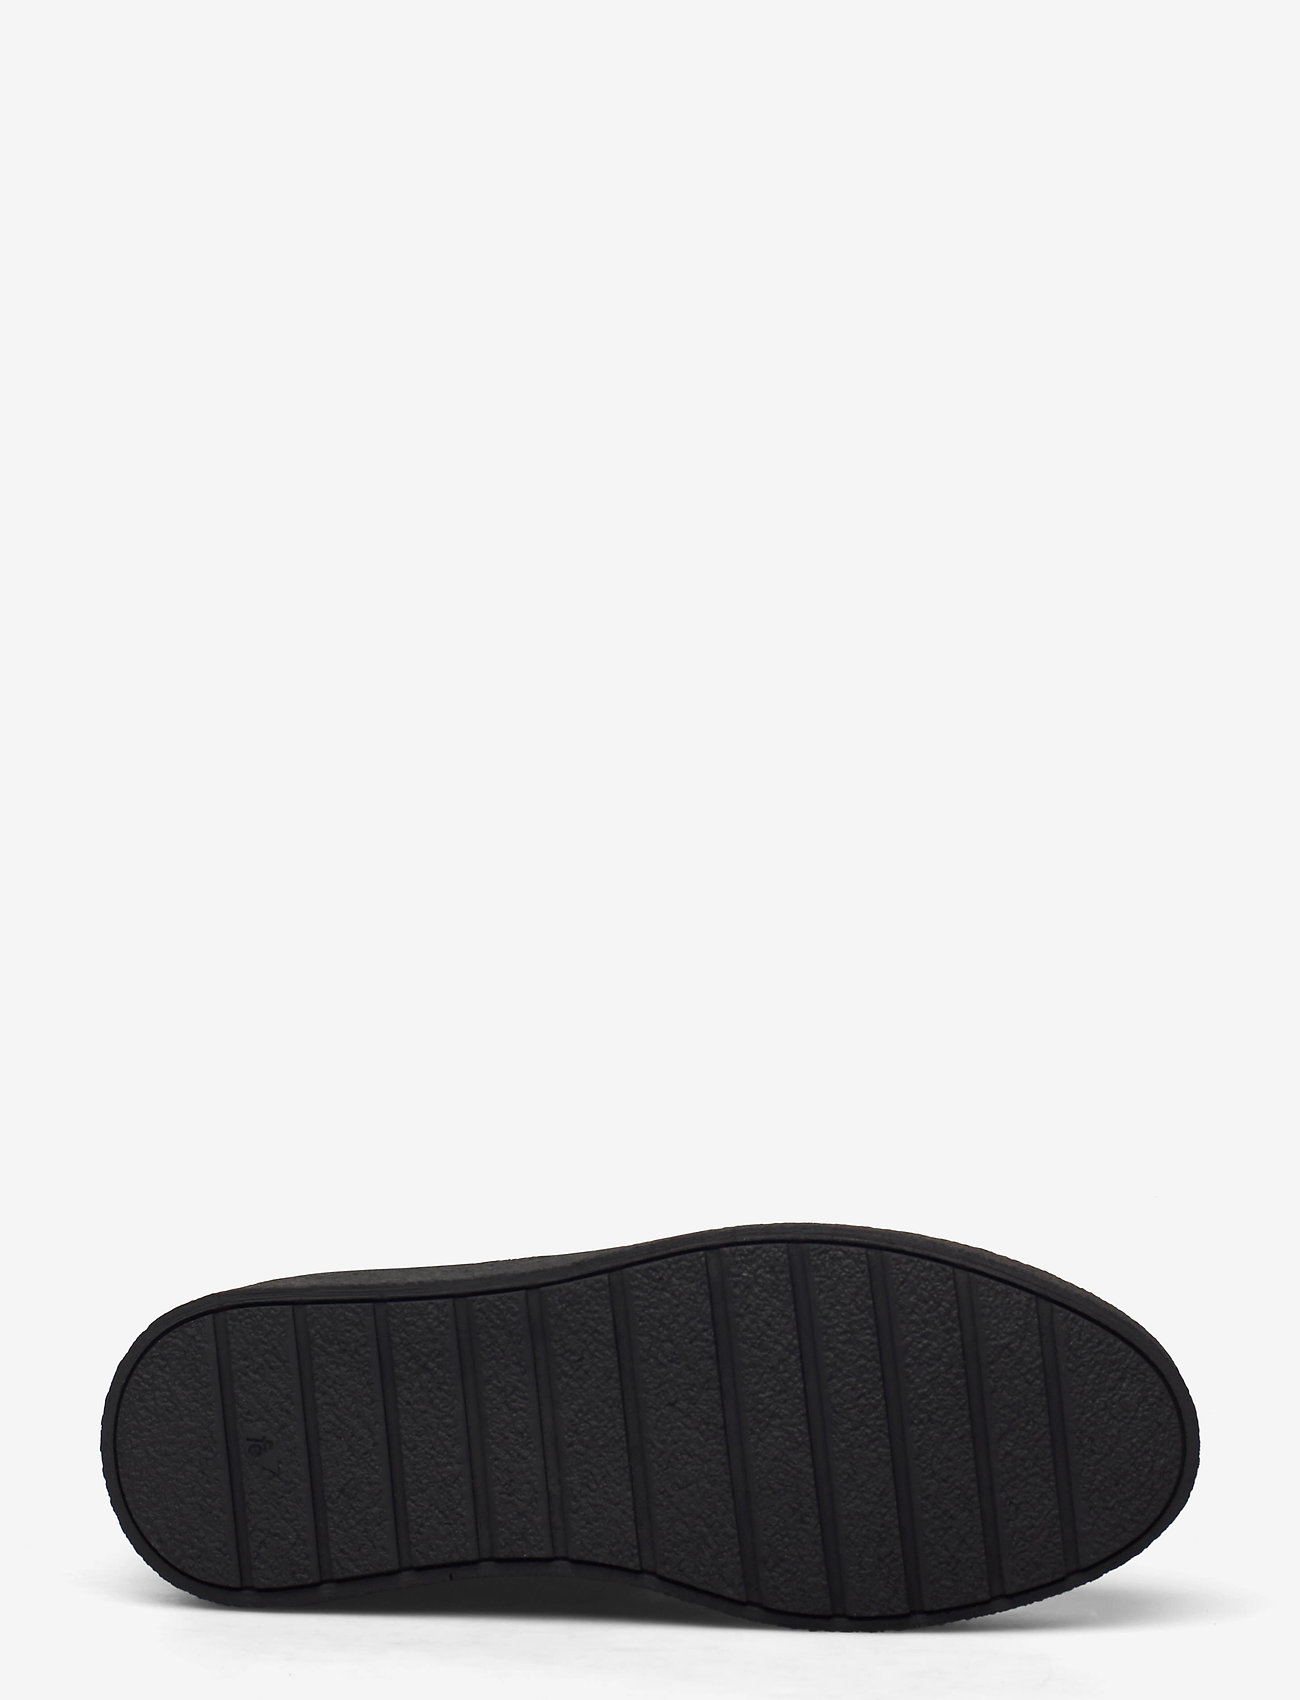 Warm Lining 14860 (Black Suede/silver 503) (225 €) - Billi Bi TFQT6